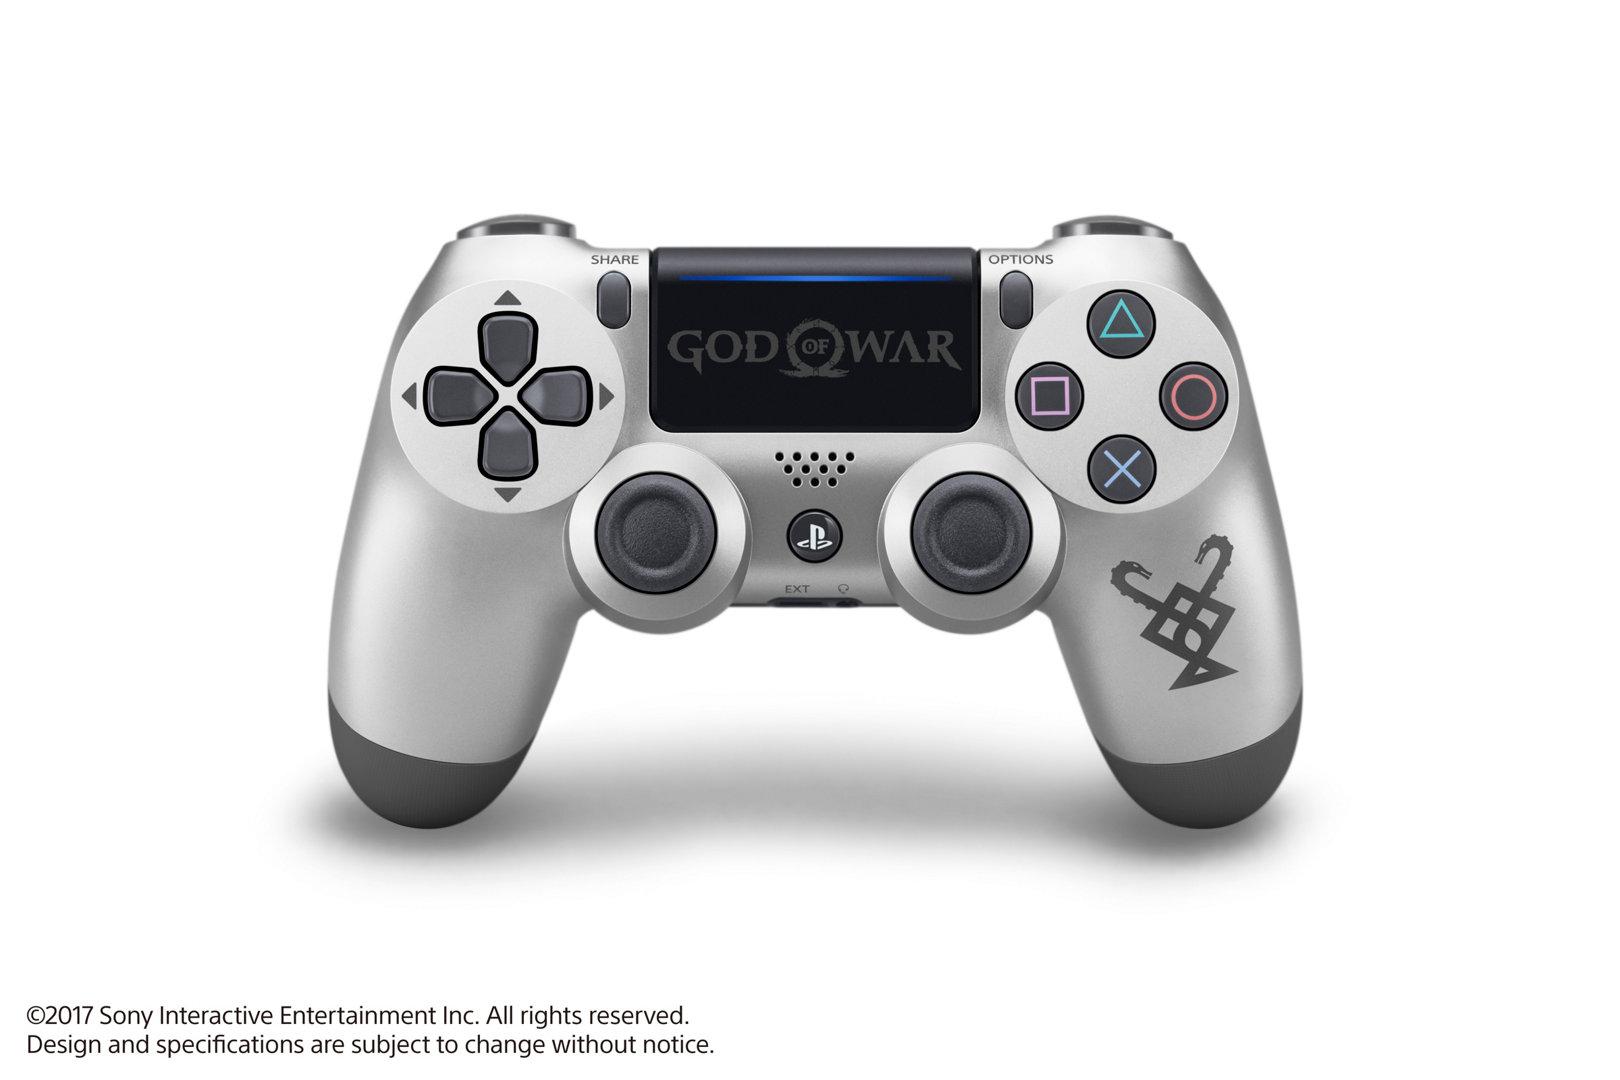 Limited Edition God of War PS4 Pro Bundle